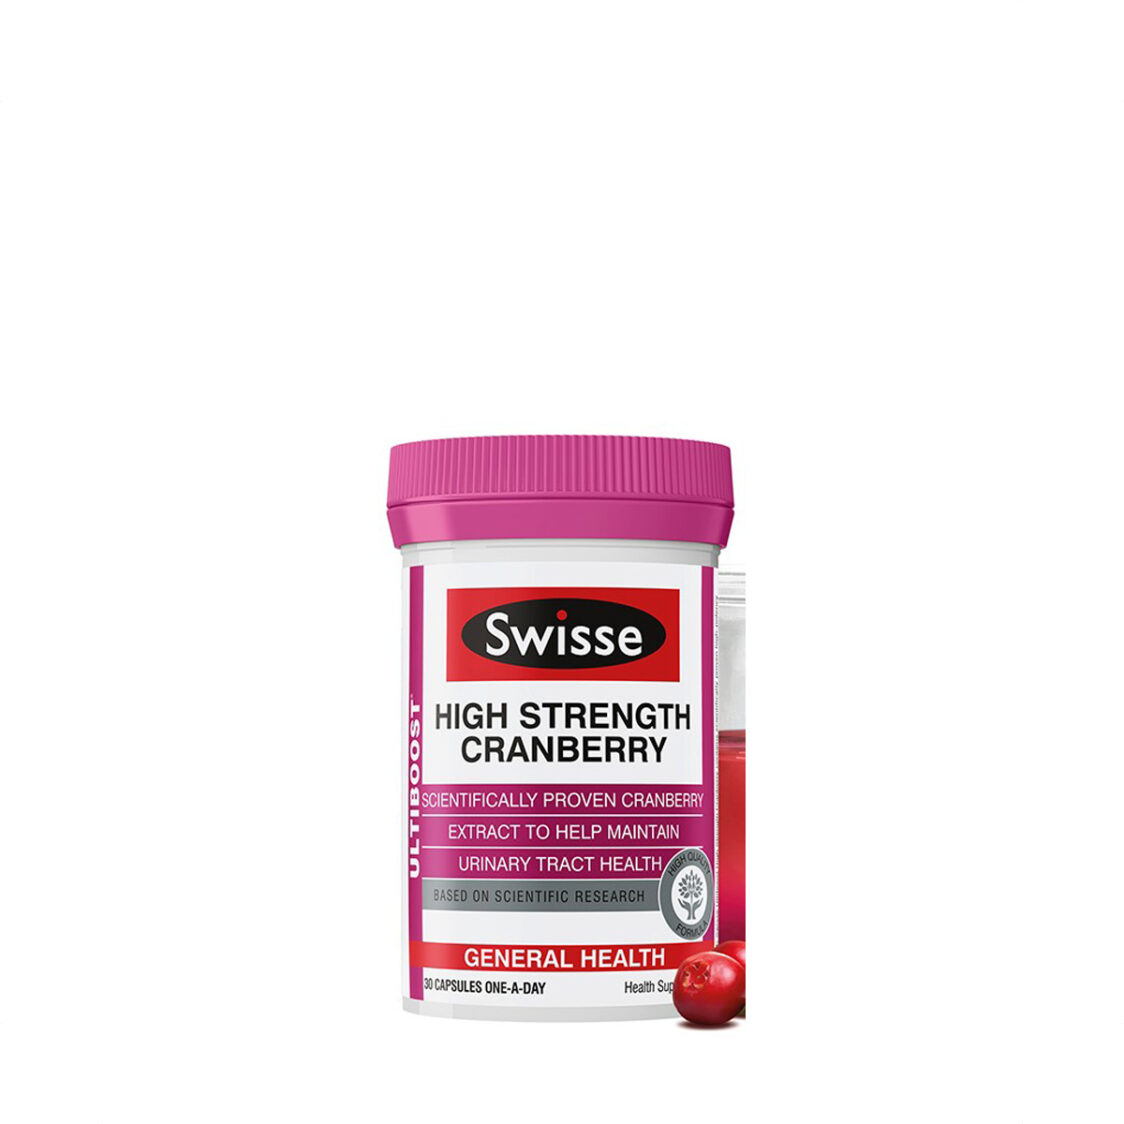 Swisse Ultiboost High Strength Cranberry 30s